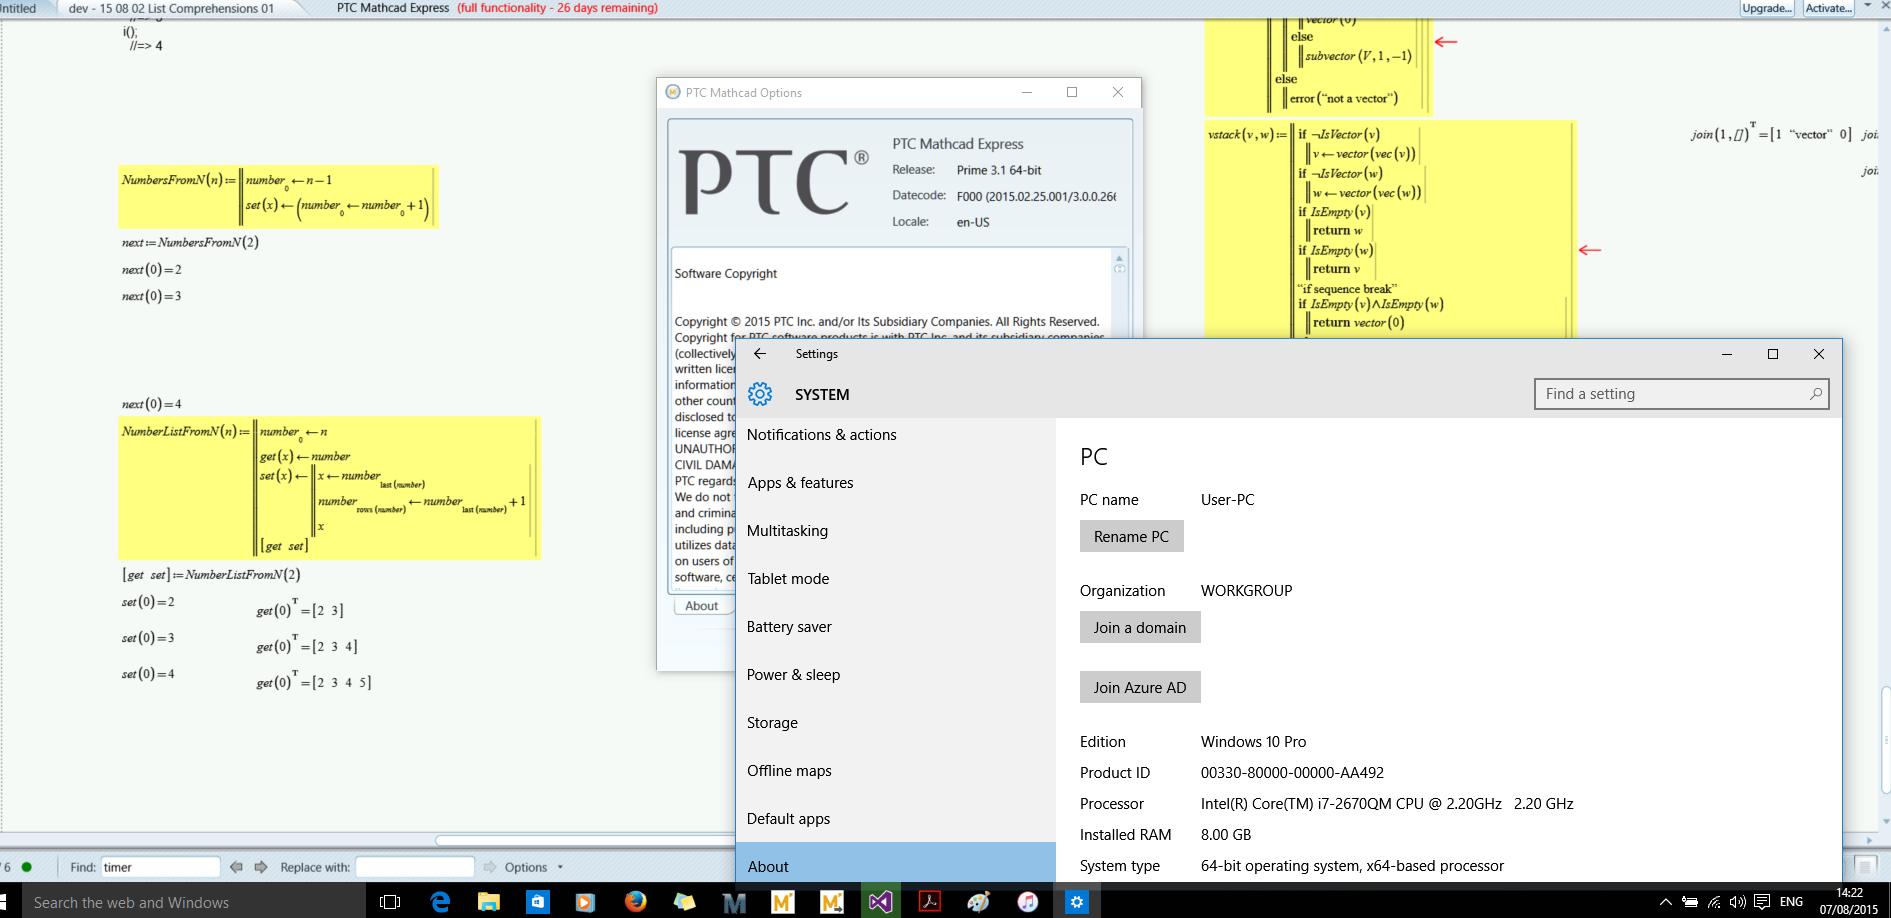 Mathcad Prime Installation fails under Windows 10     - PTC